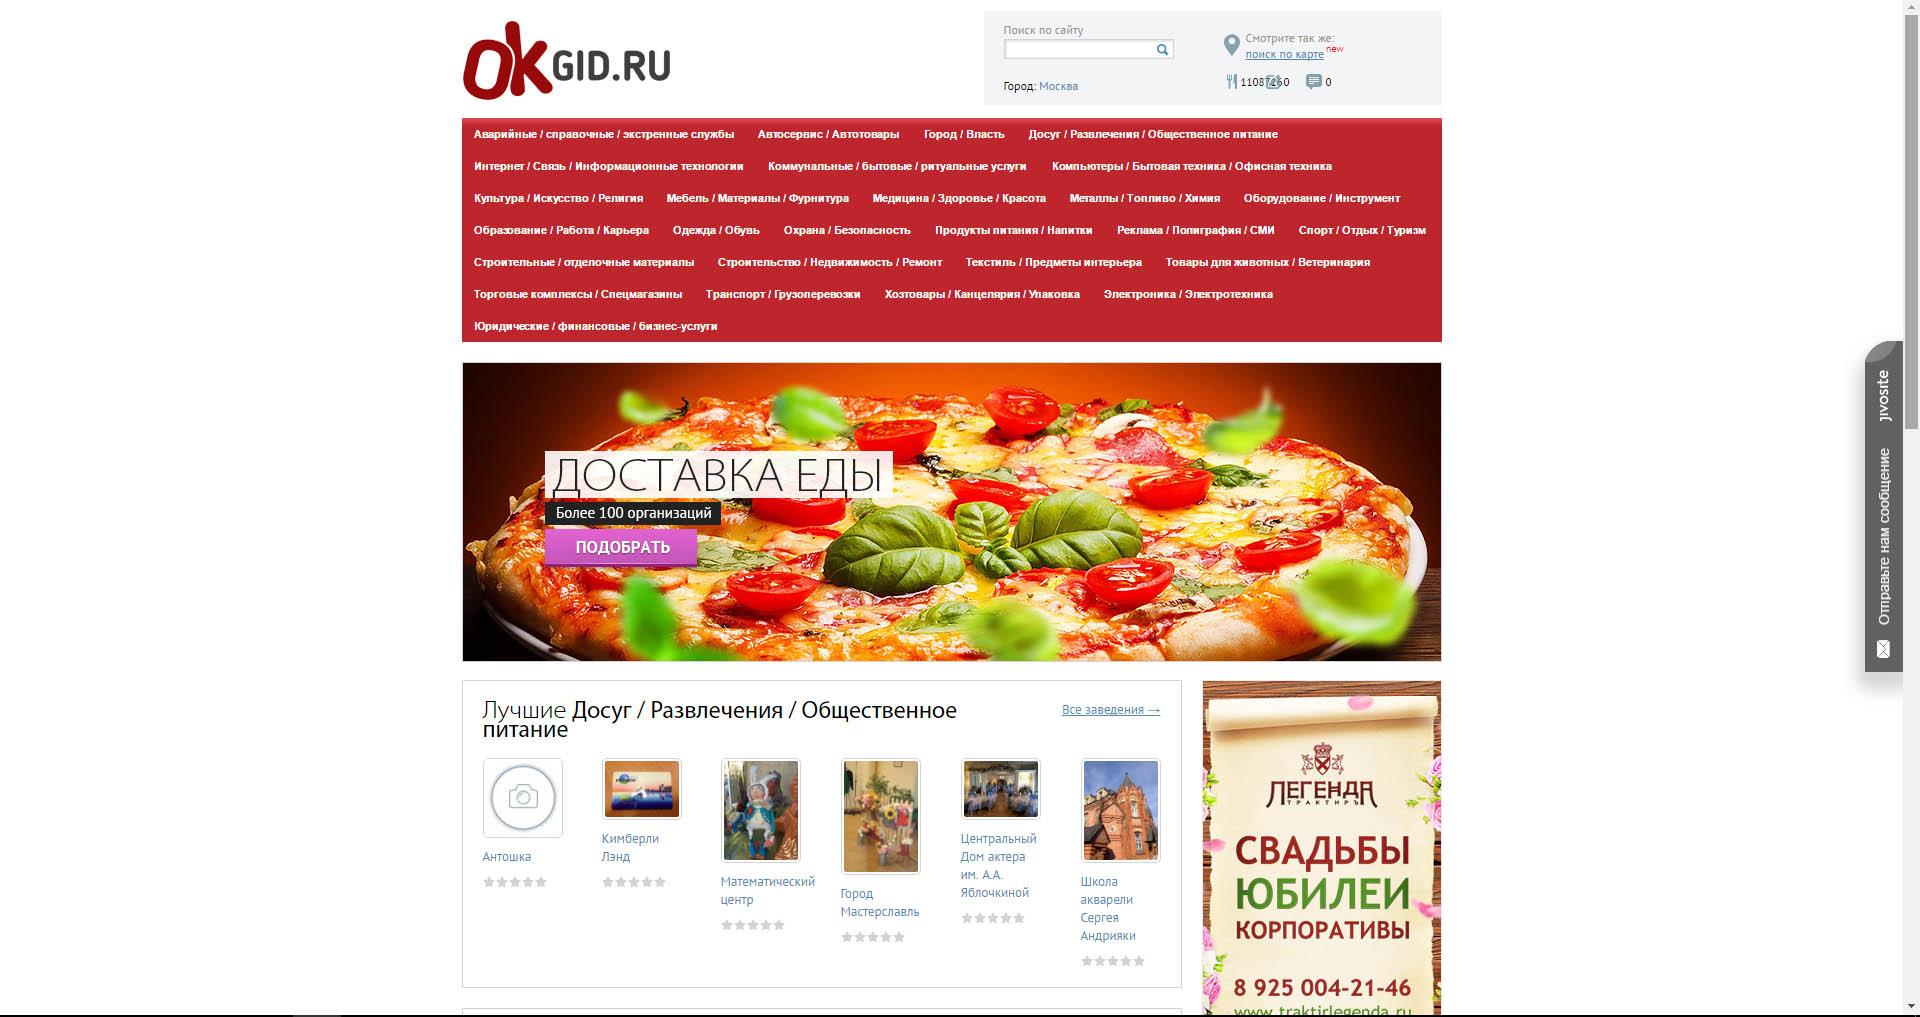 Логотип для сайта OKgid.ru фото f_92557c2d99eafeaa.jpg